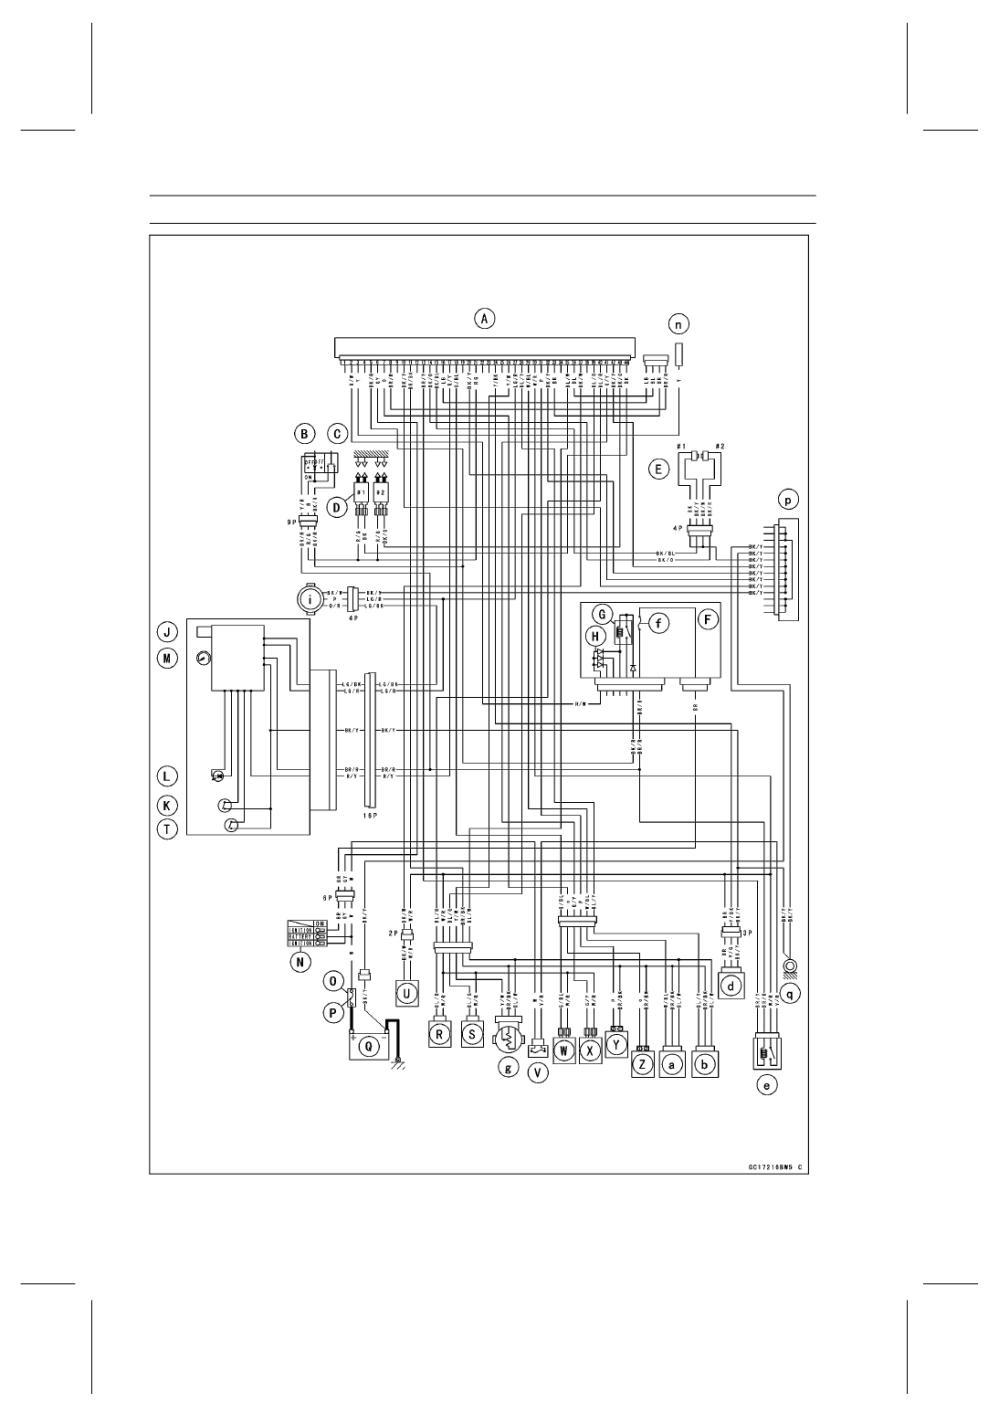 medium resolution of vulcan 1600 wiring diagram vulcan free engine image for kawasaki vulcan 800 wiring diagram kawasaki vn 1500 fuel pump wiring diagram